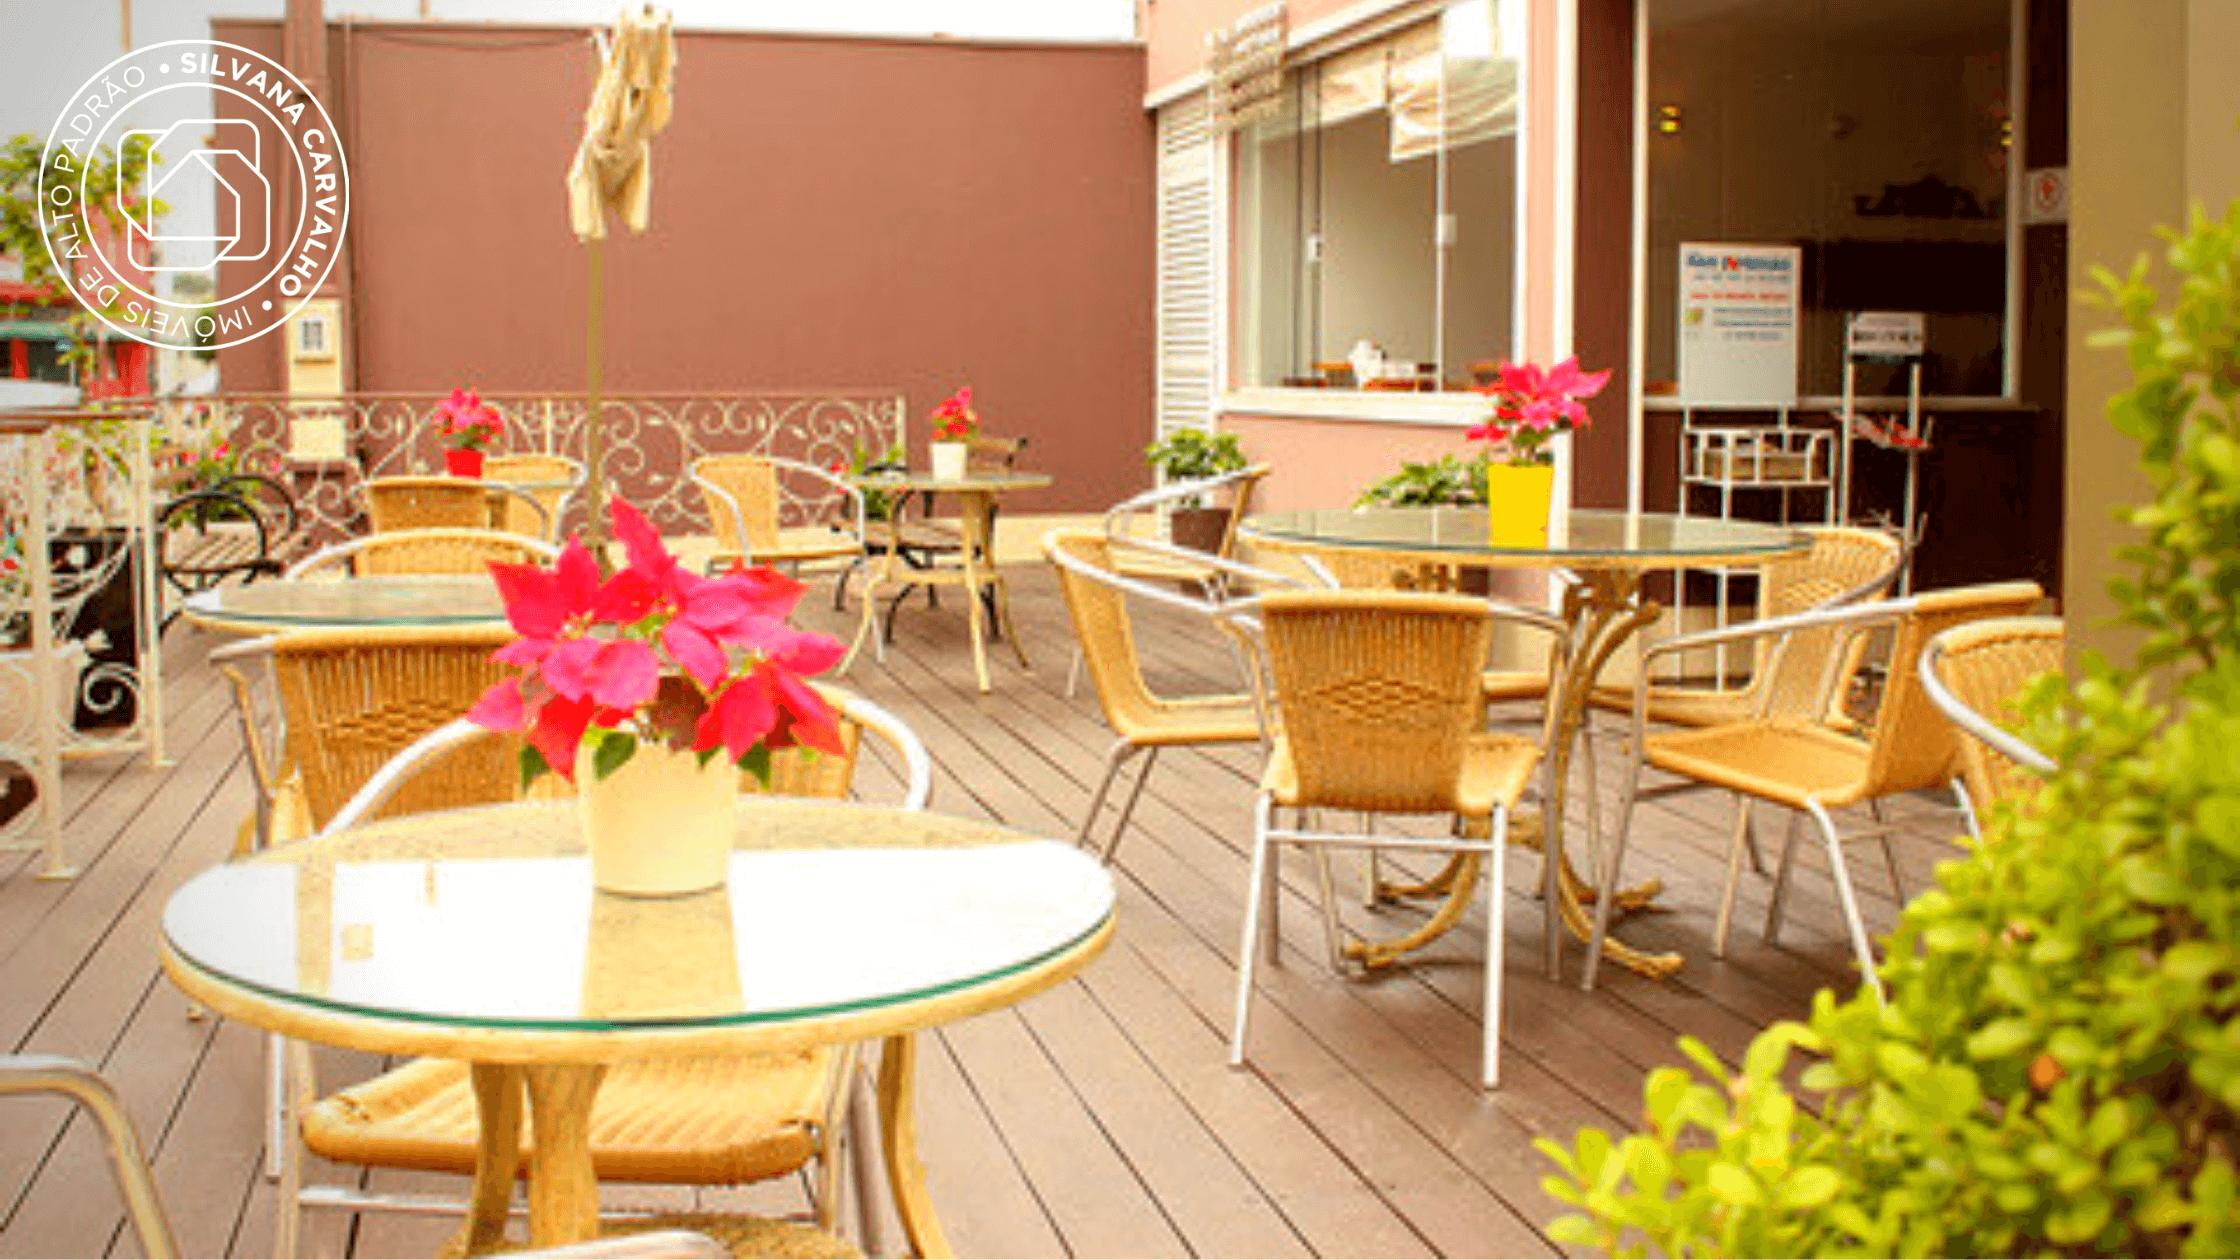 Restaurante La Fée – (Foto: Notícias de Indaiatuba)